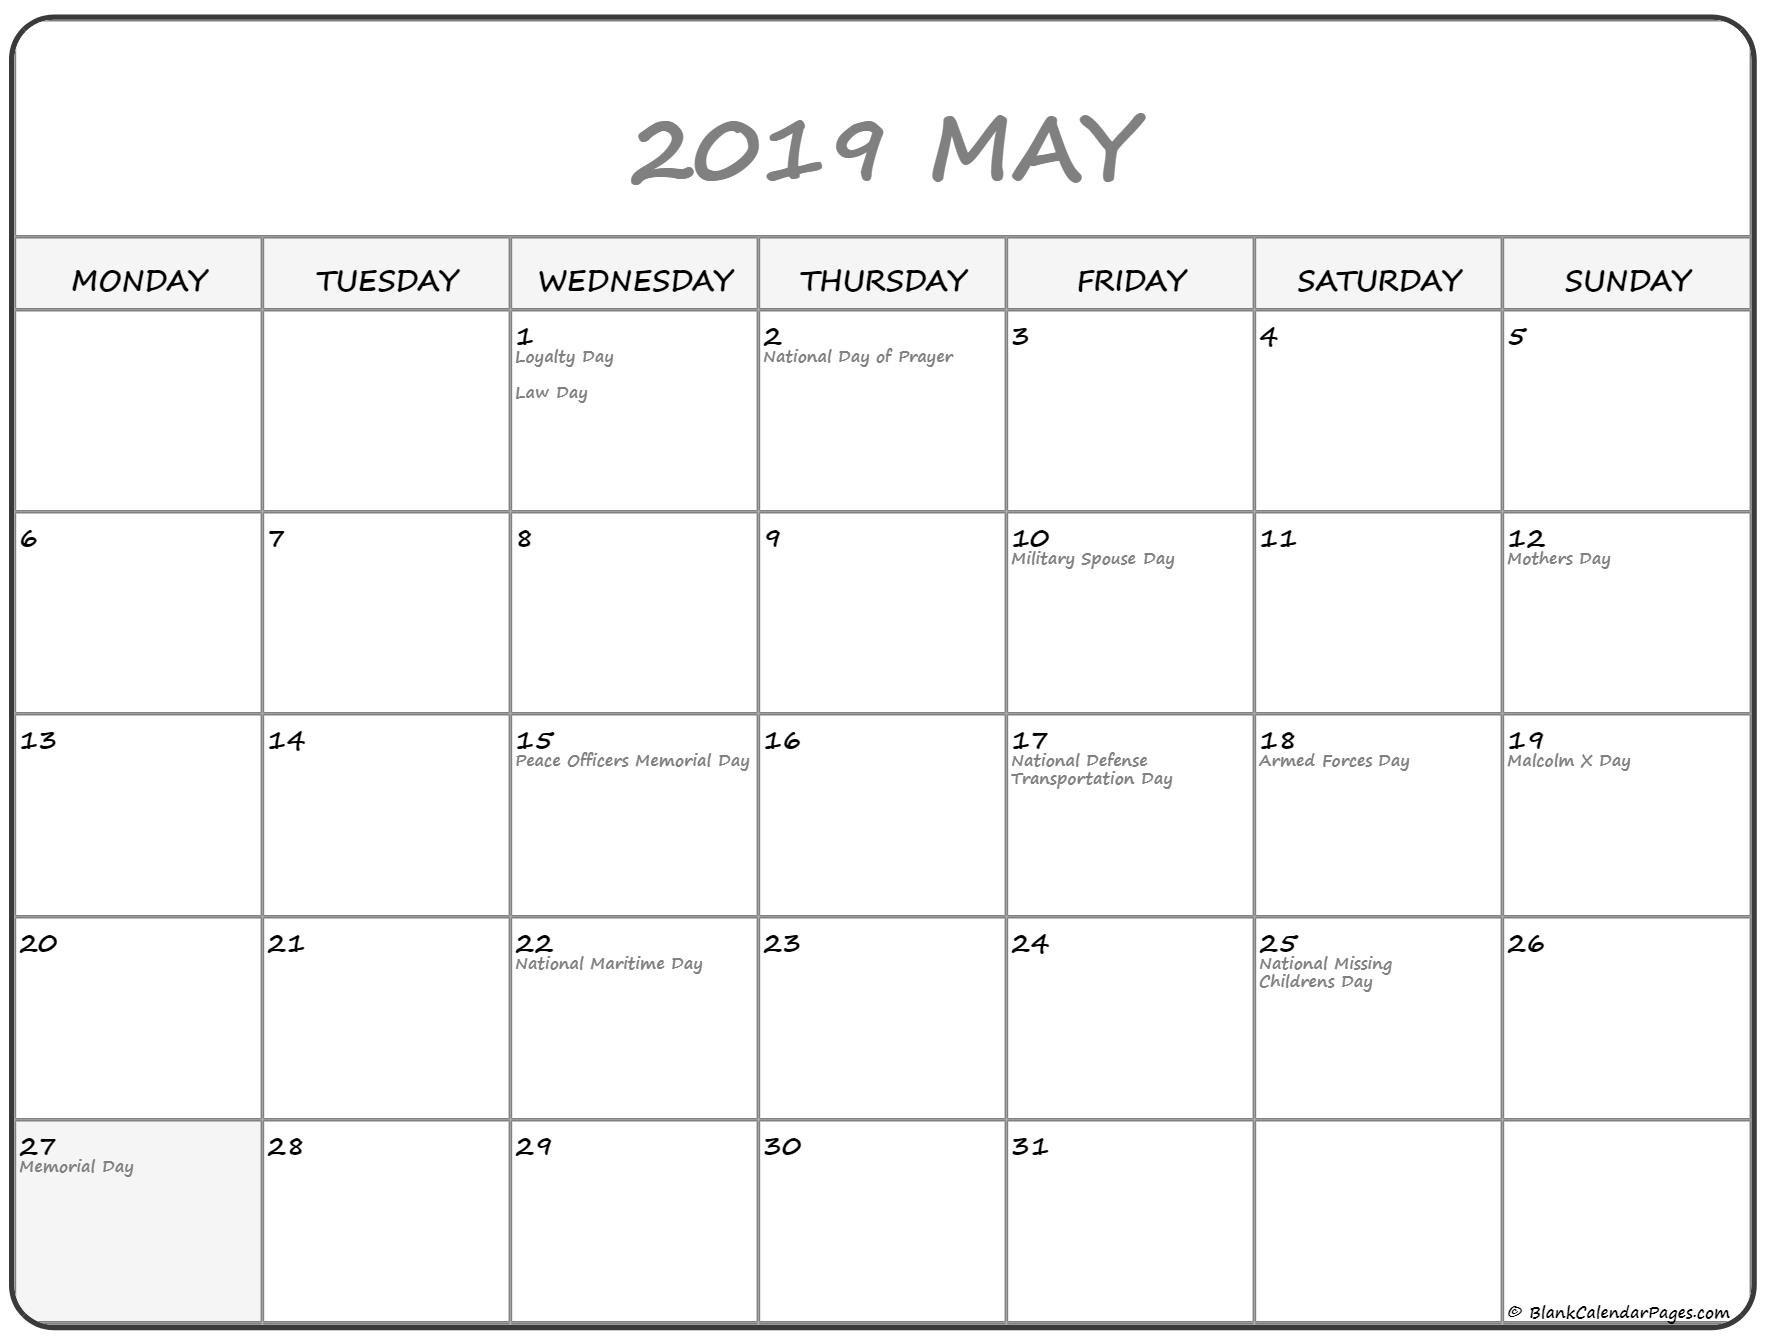 May 2019 Monday Calendar | Monday To Sunday May Calendar Starting On Monday